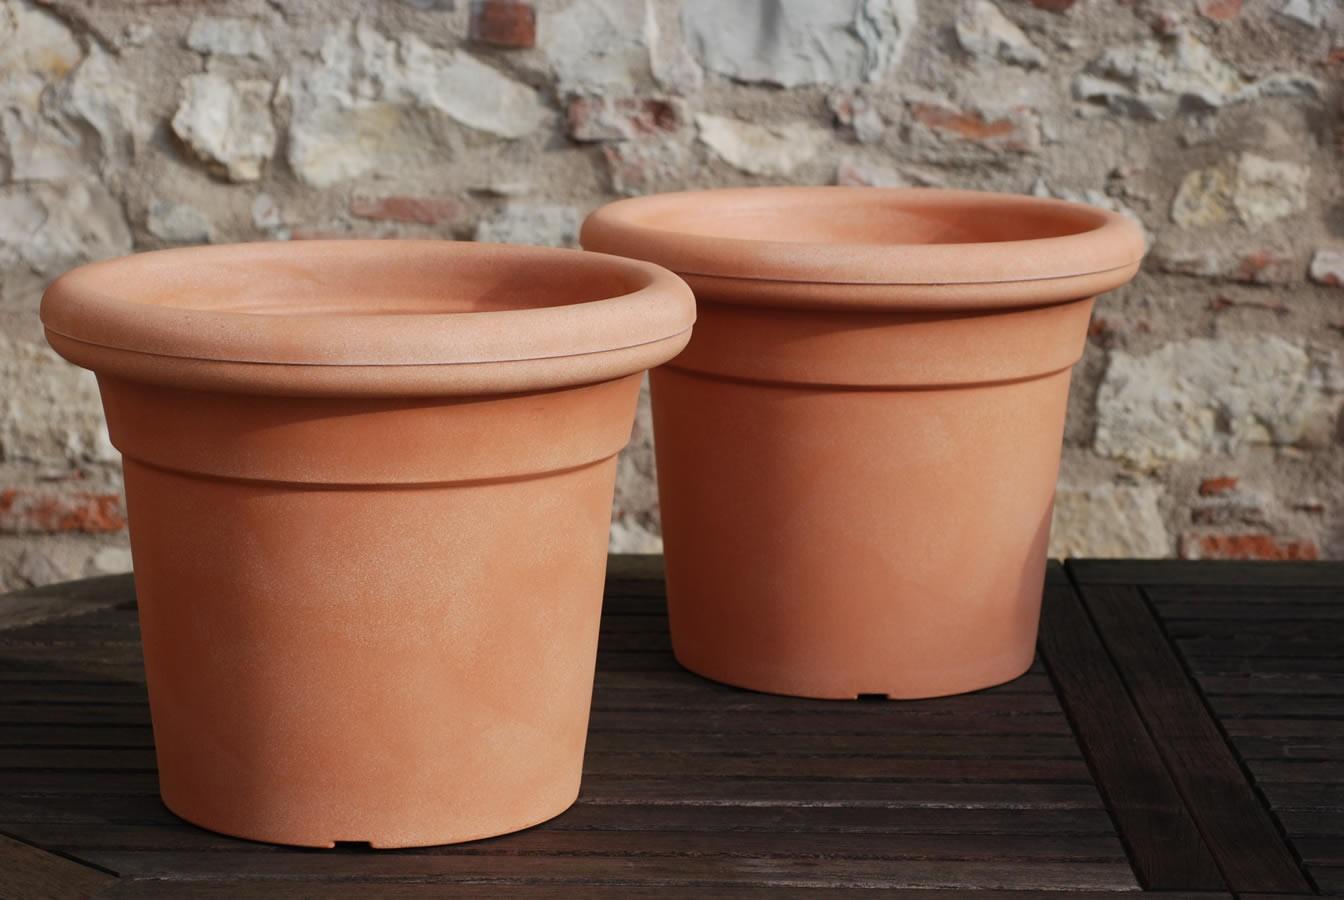 Vaso classico terracotta plastica kronos nicoli for Vasi in terracotta da giardino prezzo